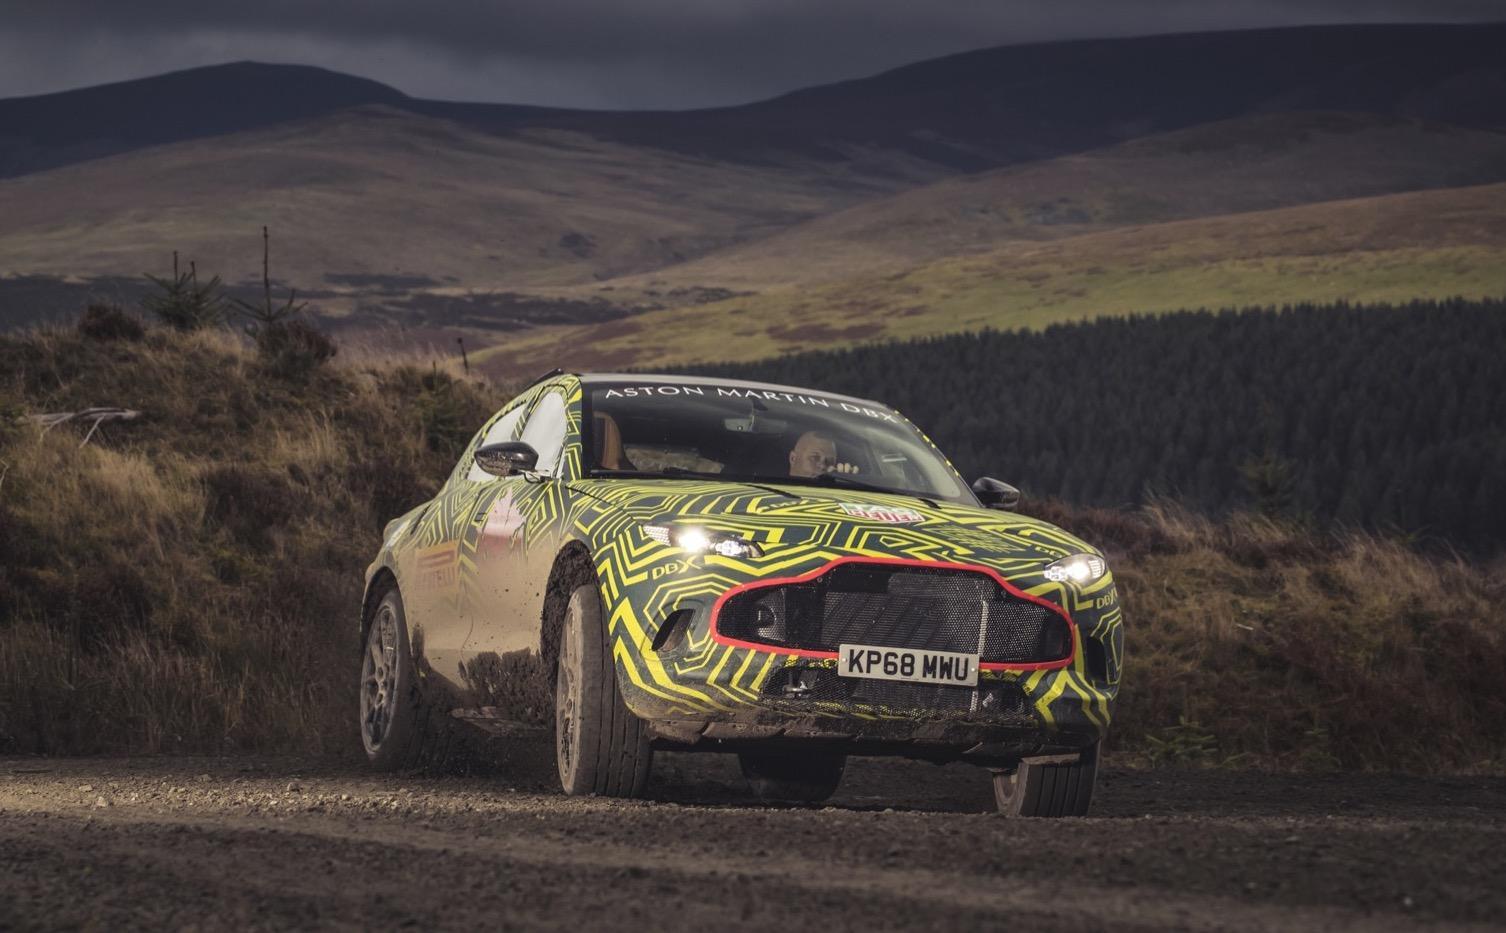 Aston Martin Dbx Suv Revealed As Latest Luxe Truck Slashgear